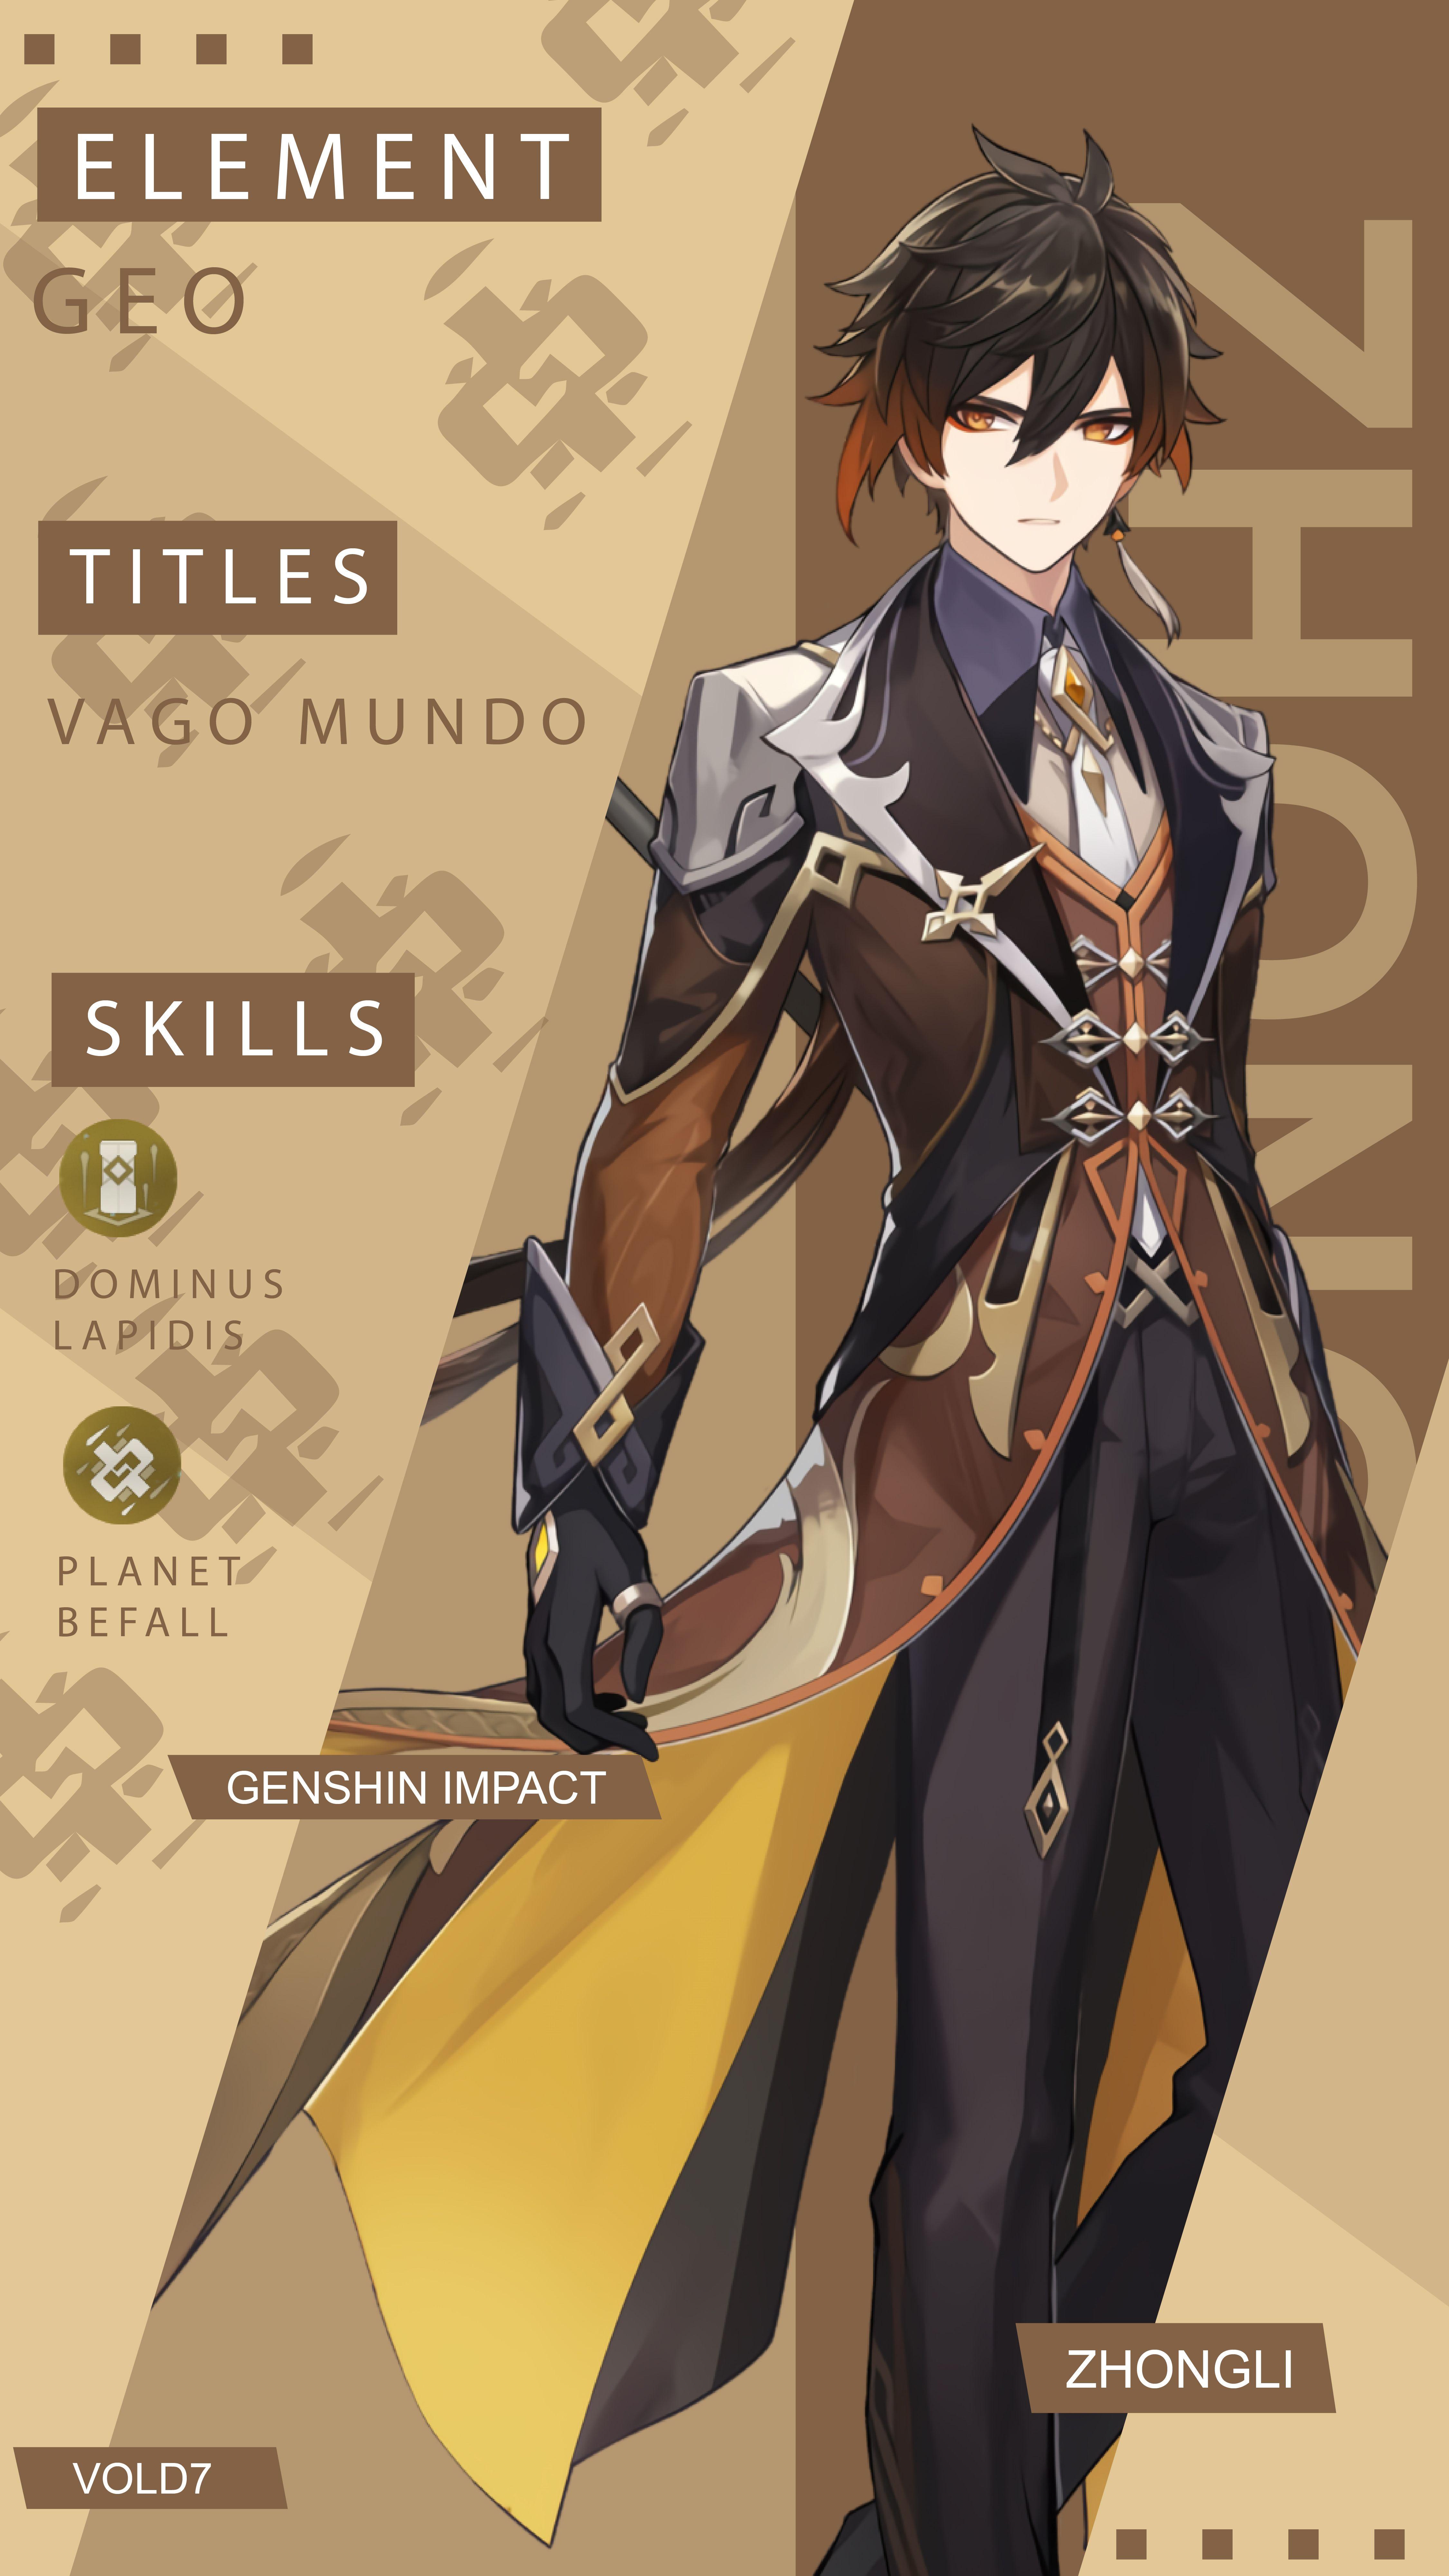 Genshin Impact Zhongli Wallpaper Android Impact Character Wallpaper Character Design Male